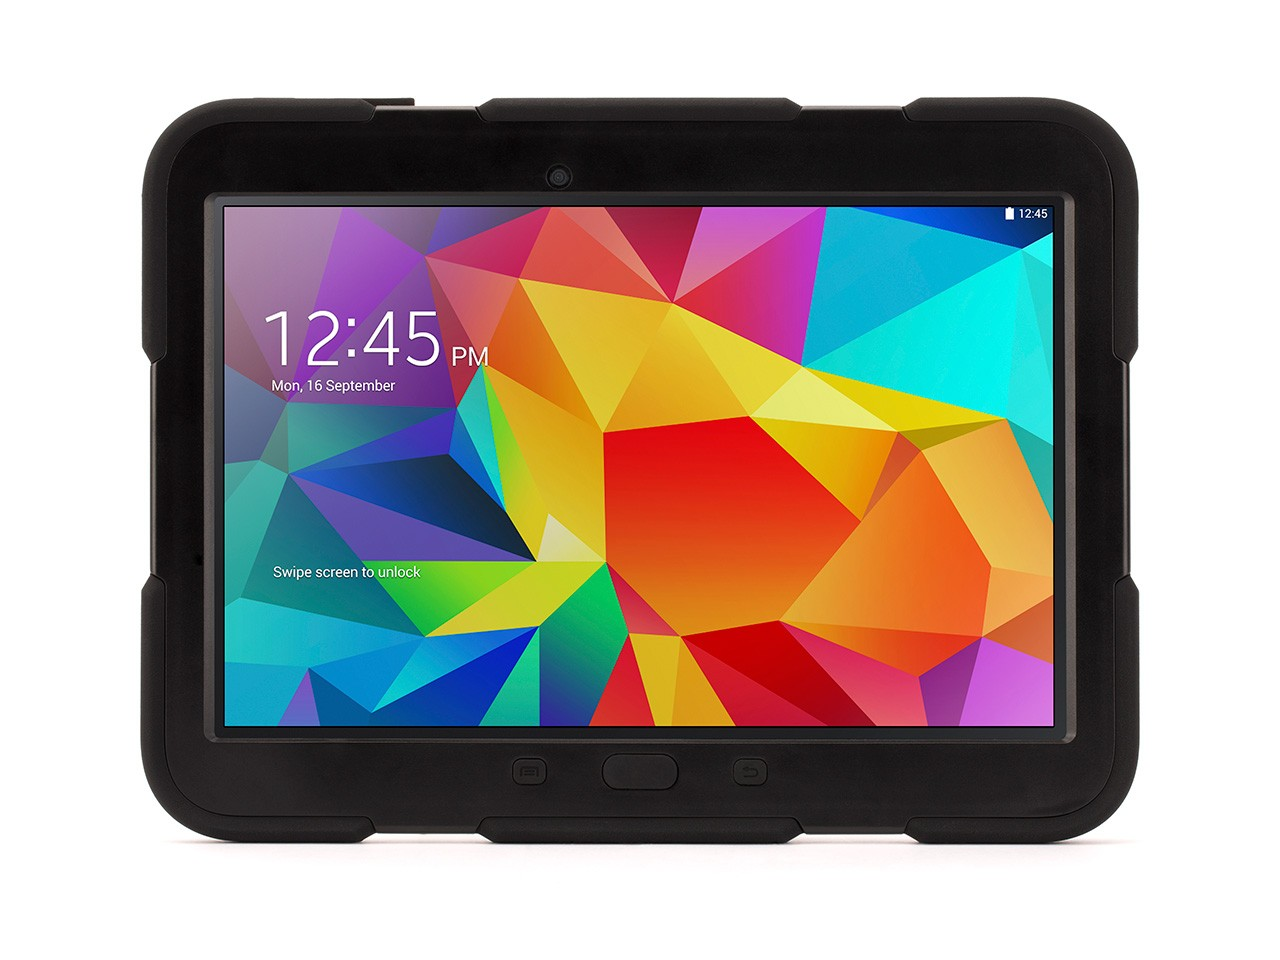 heavy duty shock proof case screen protector for samsung galaxy tab 4 10 1 ebay. Black Bedroom Furniture Sets. Home Design Ideas